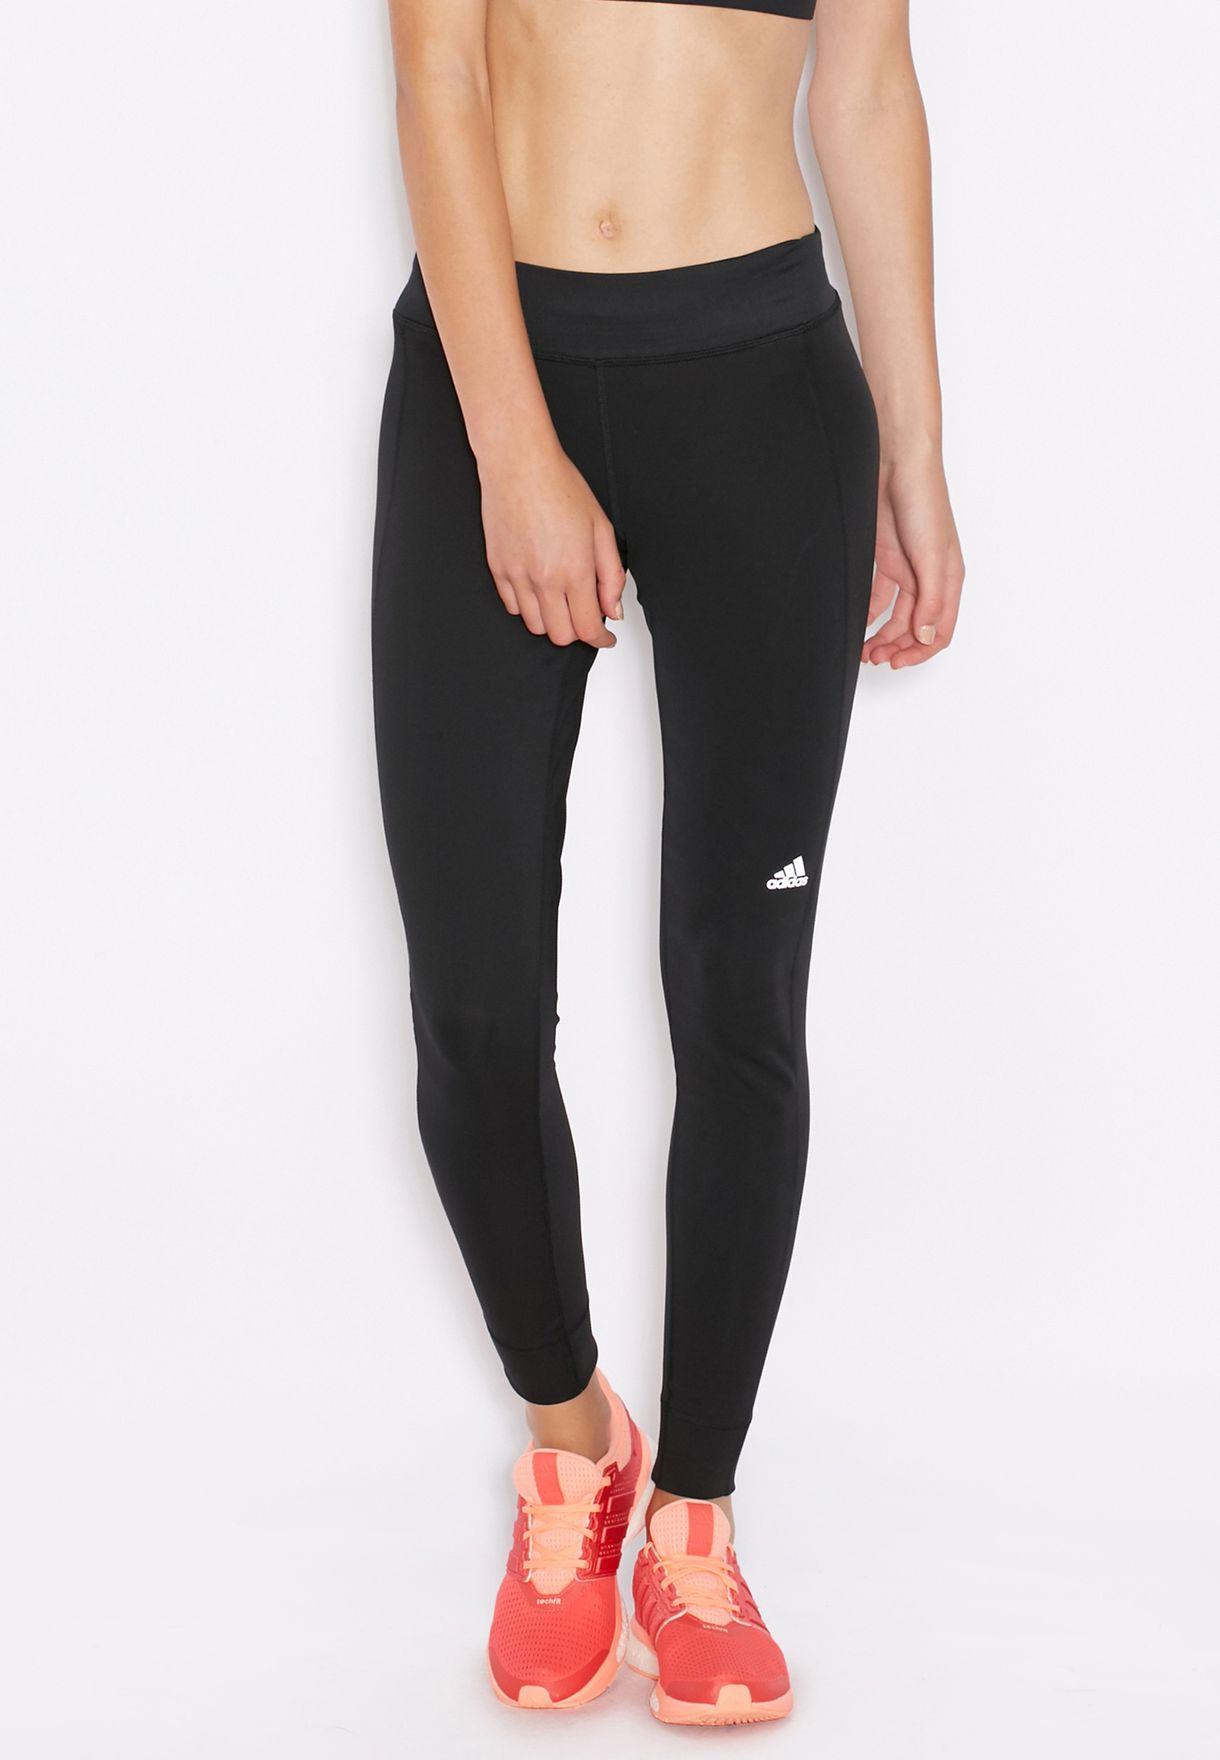 2a1a2dc6ddf1a Shop adidas black Run Leggings S10295 for Women in Saudi - AD476AT53PVA